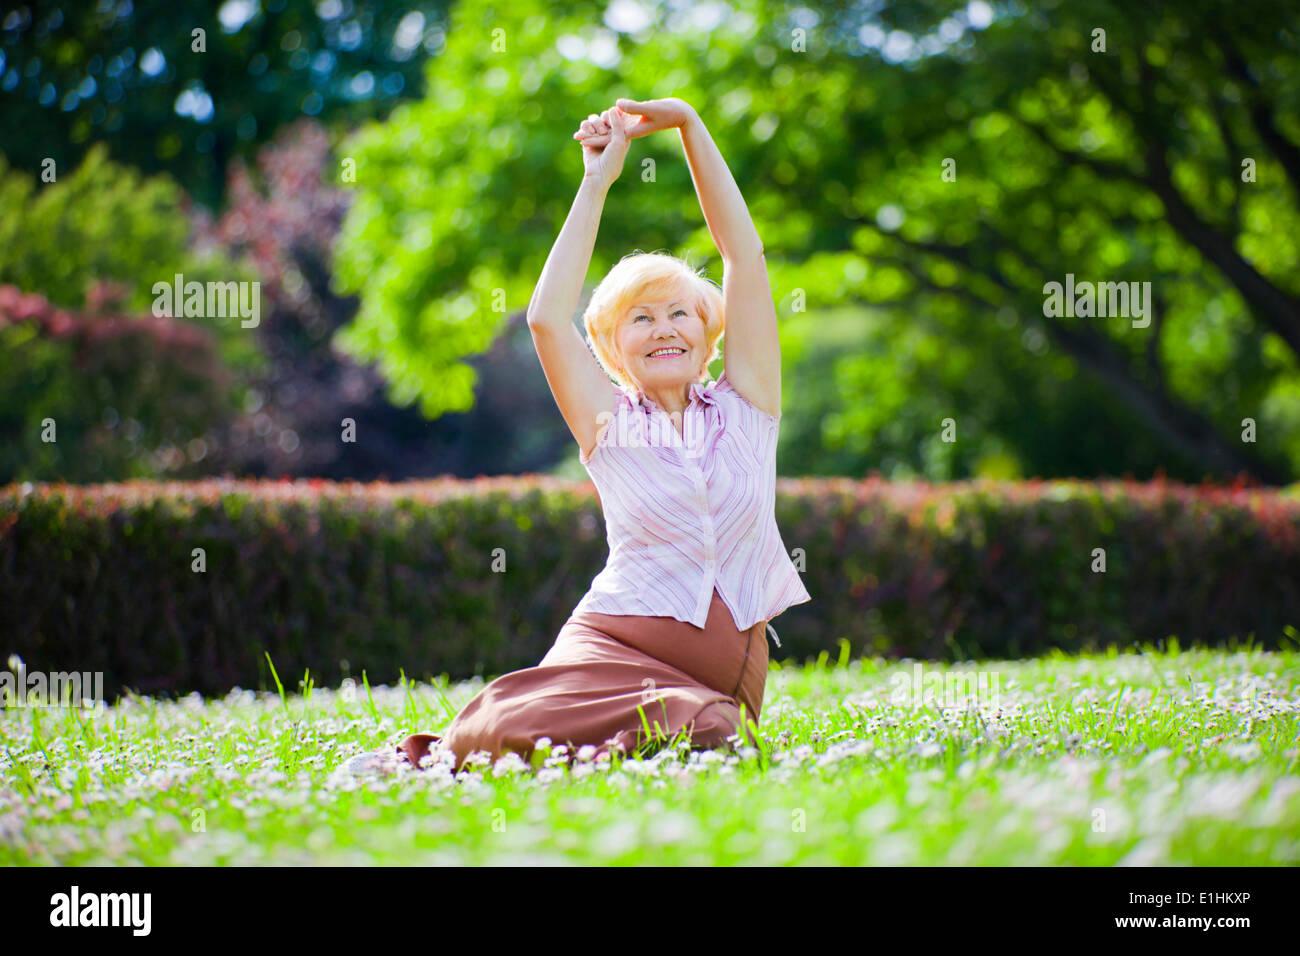 Wellness. Salud Mental. Anciana optimista el ejercicio al aire libre. Imagen De Stock